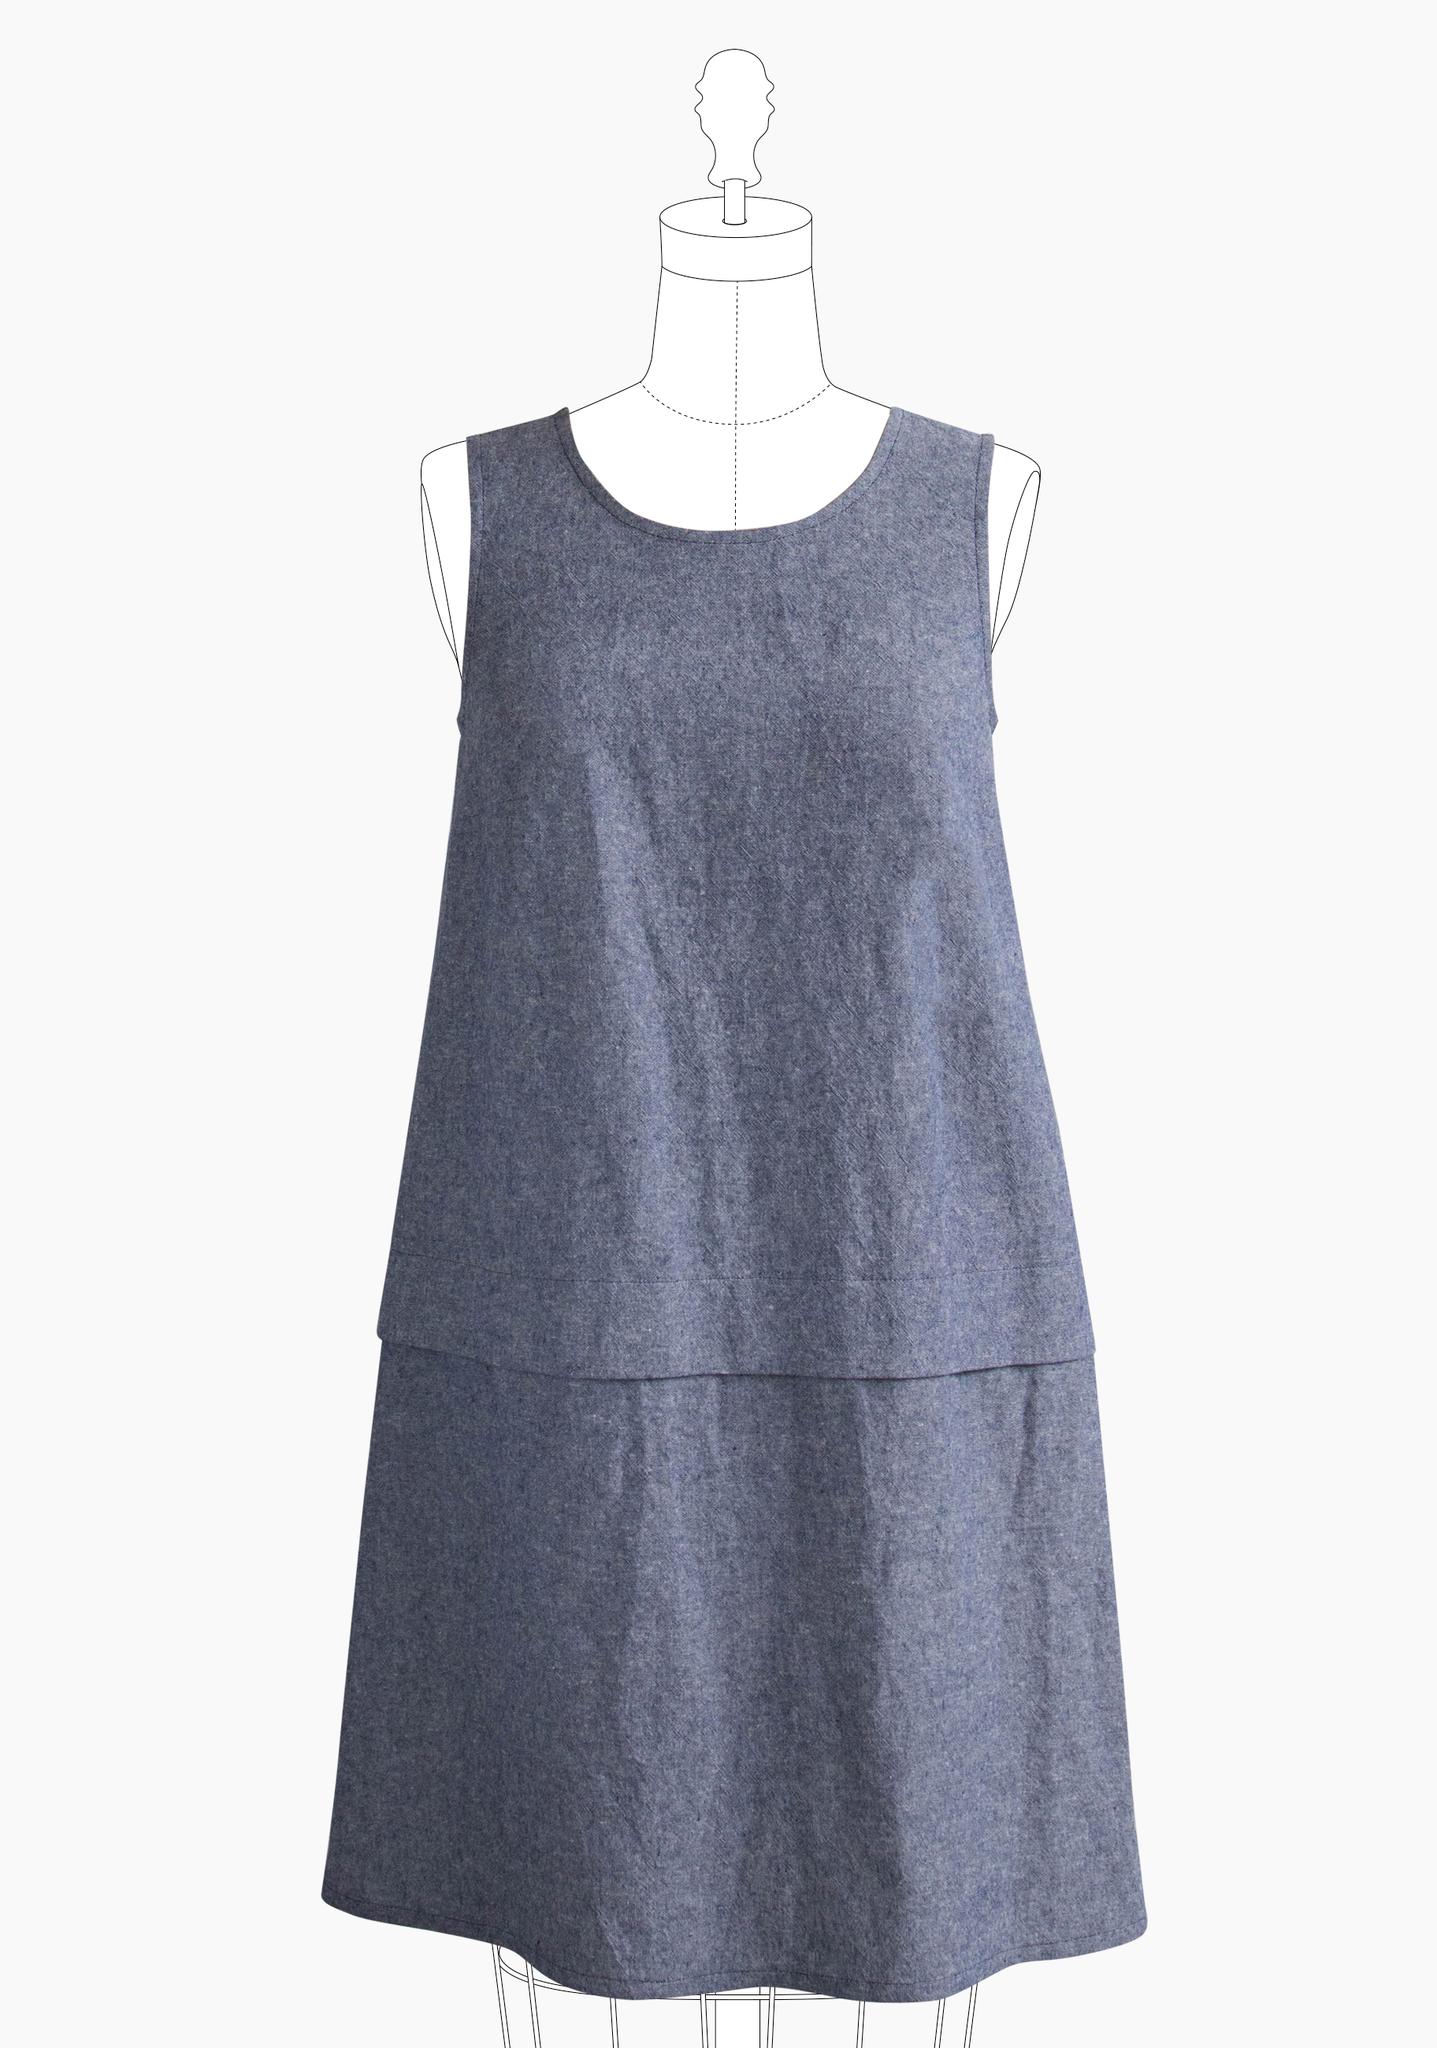 7510de3b16 Willow Dress add placket for breastfeeding